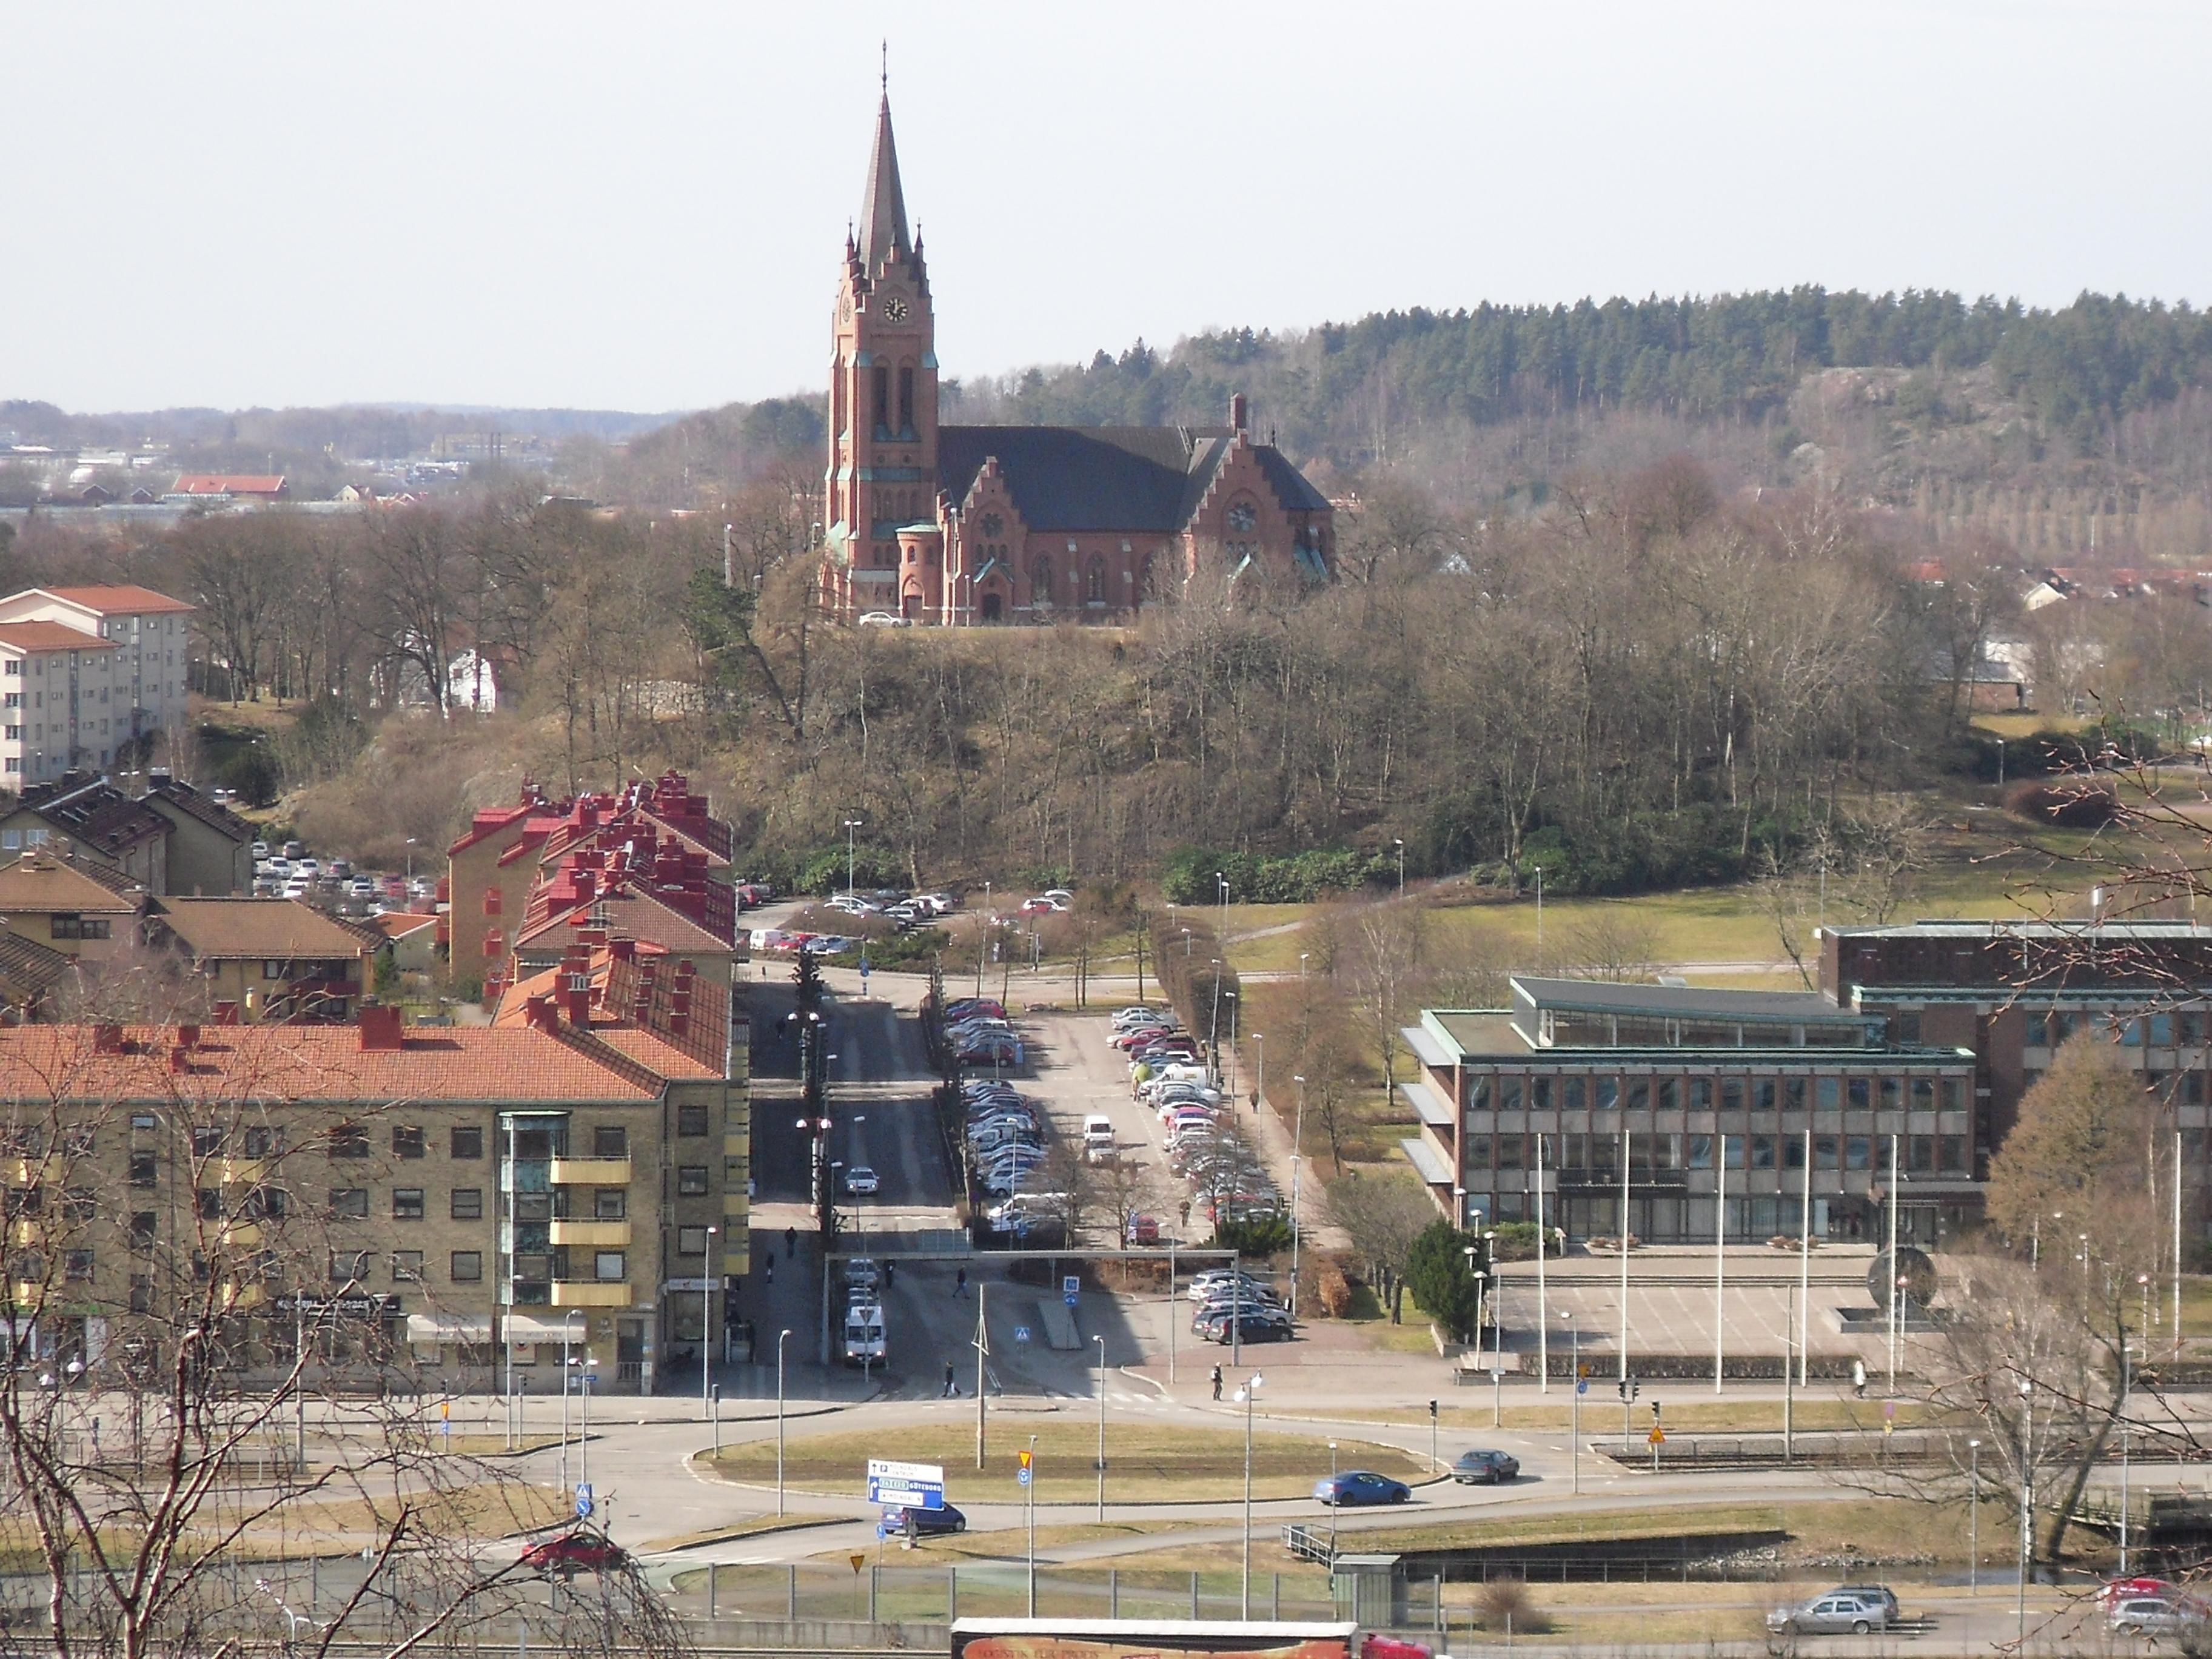 Fil:Fssbergs kyrka redteksystems.net Wikipedia